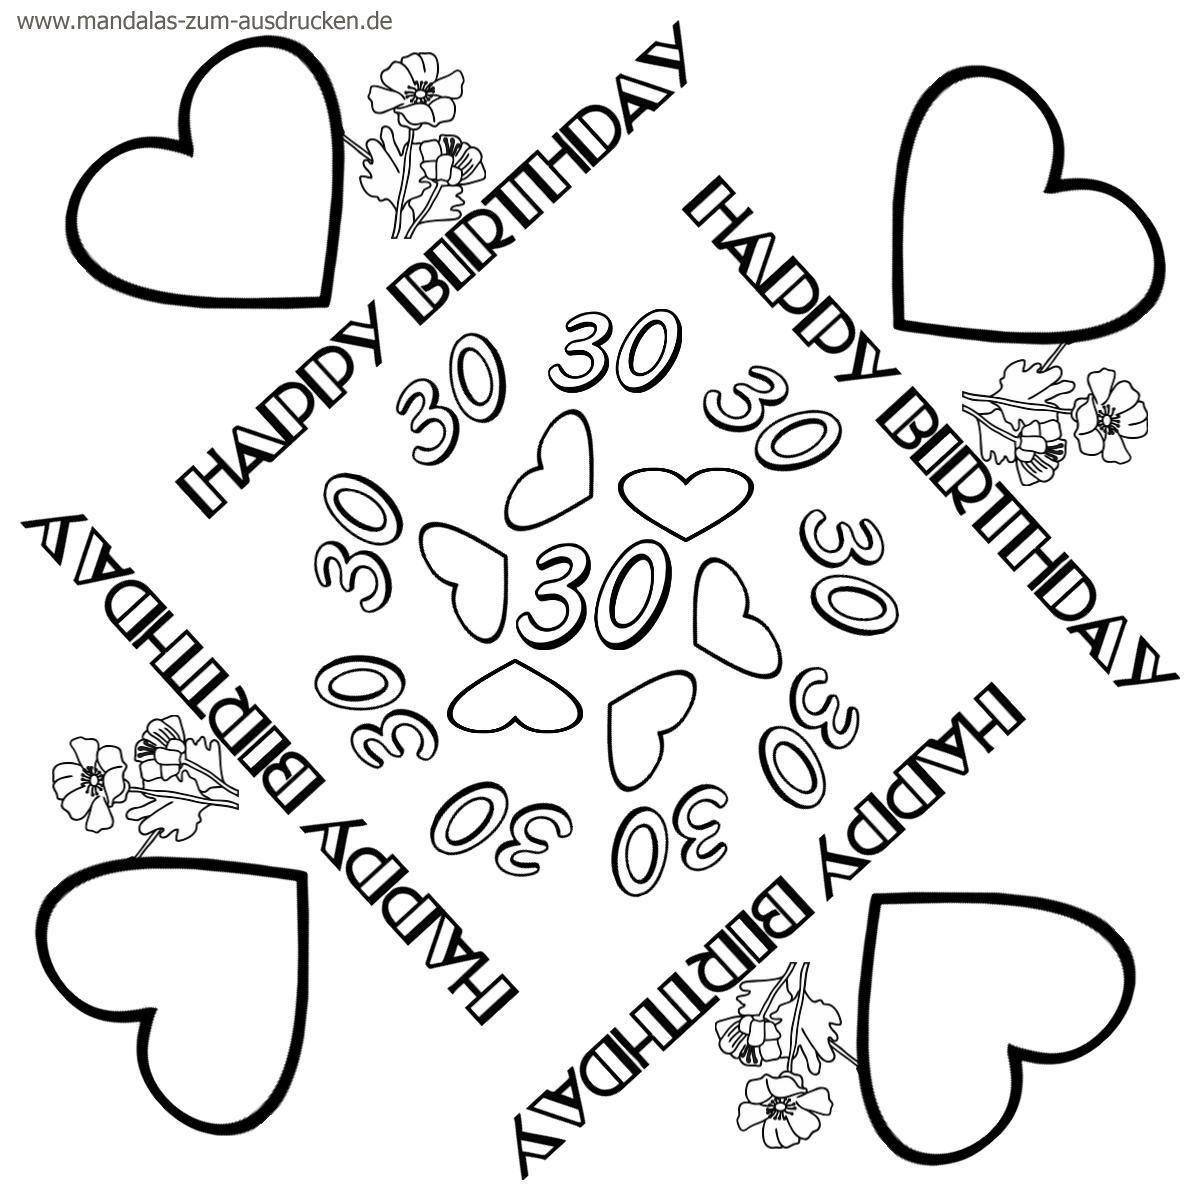 Mandala Geburtstag Zum Download (With Images) | Mandala bestimmt für Mandalas Geburtstag